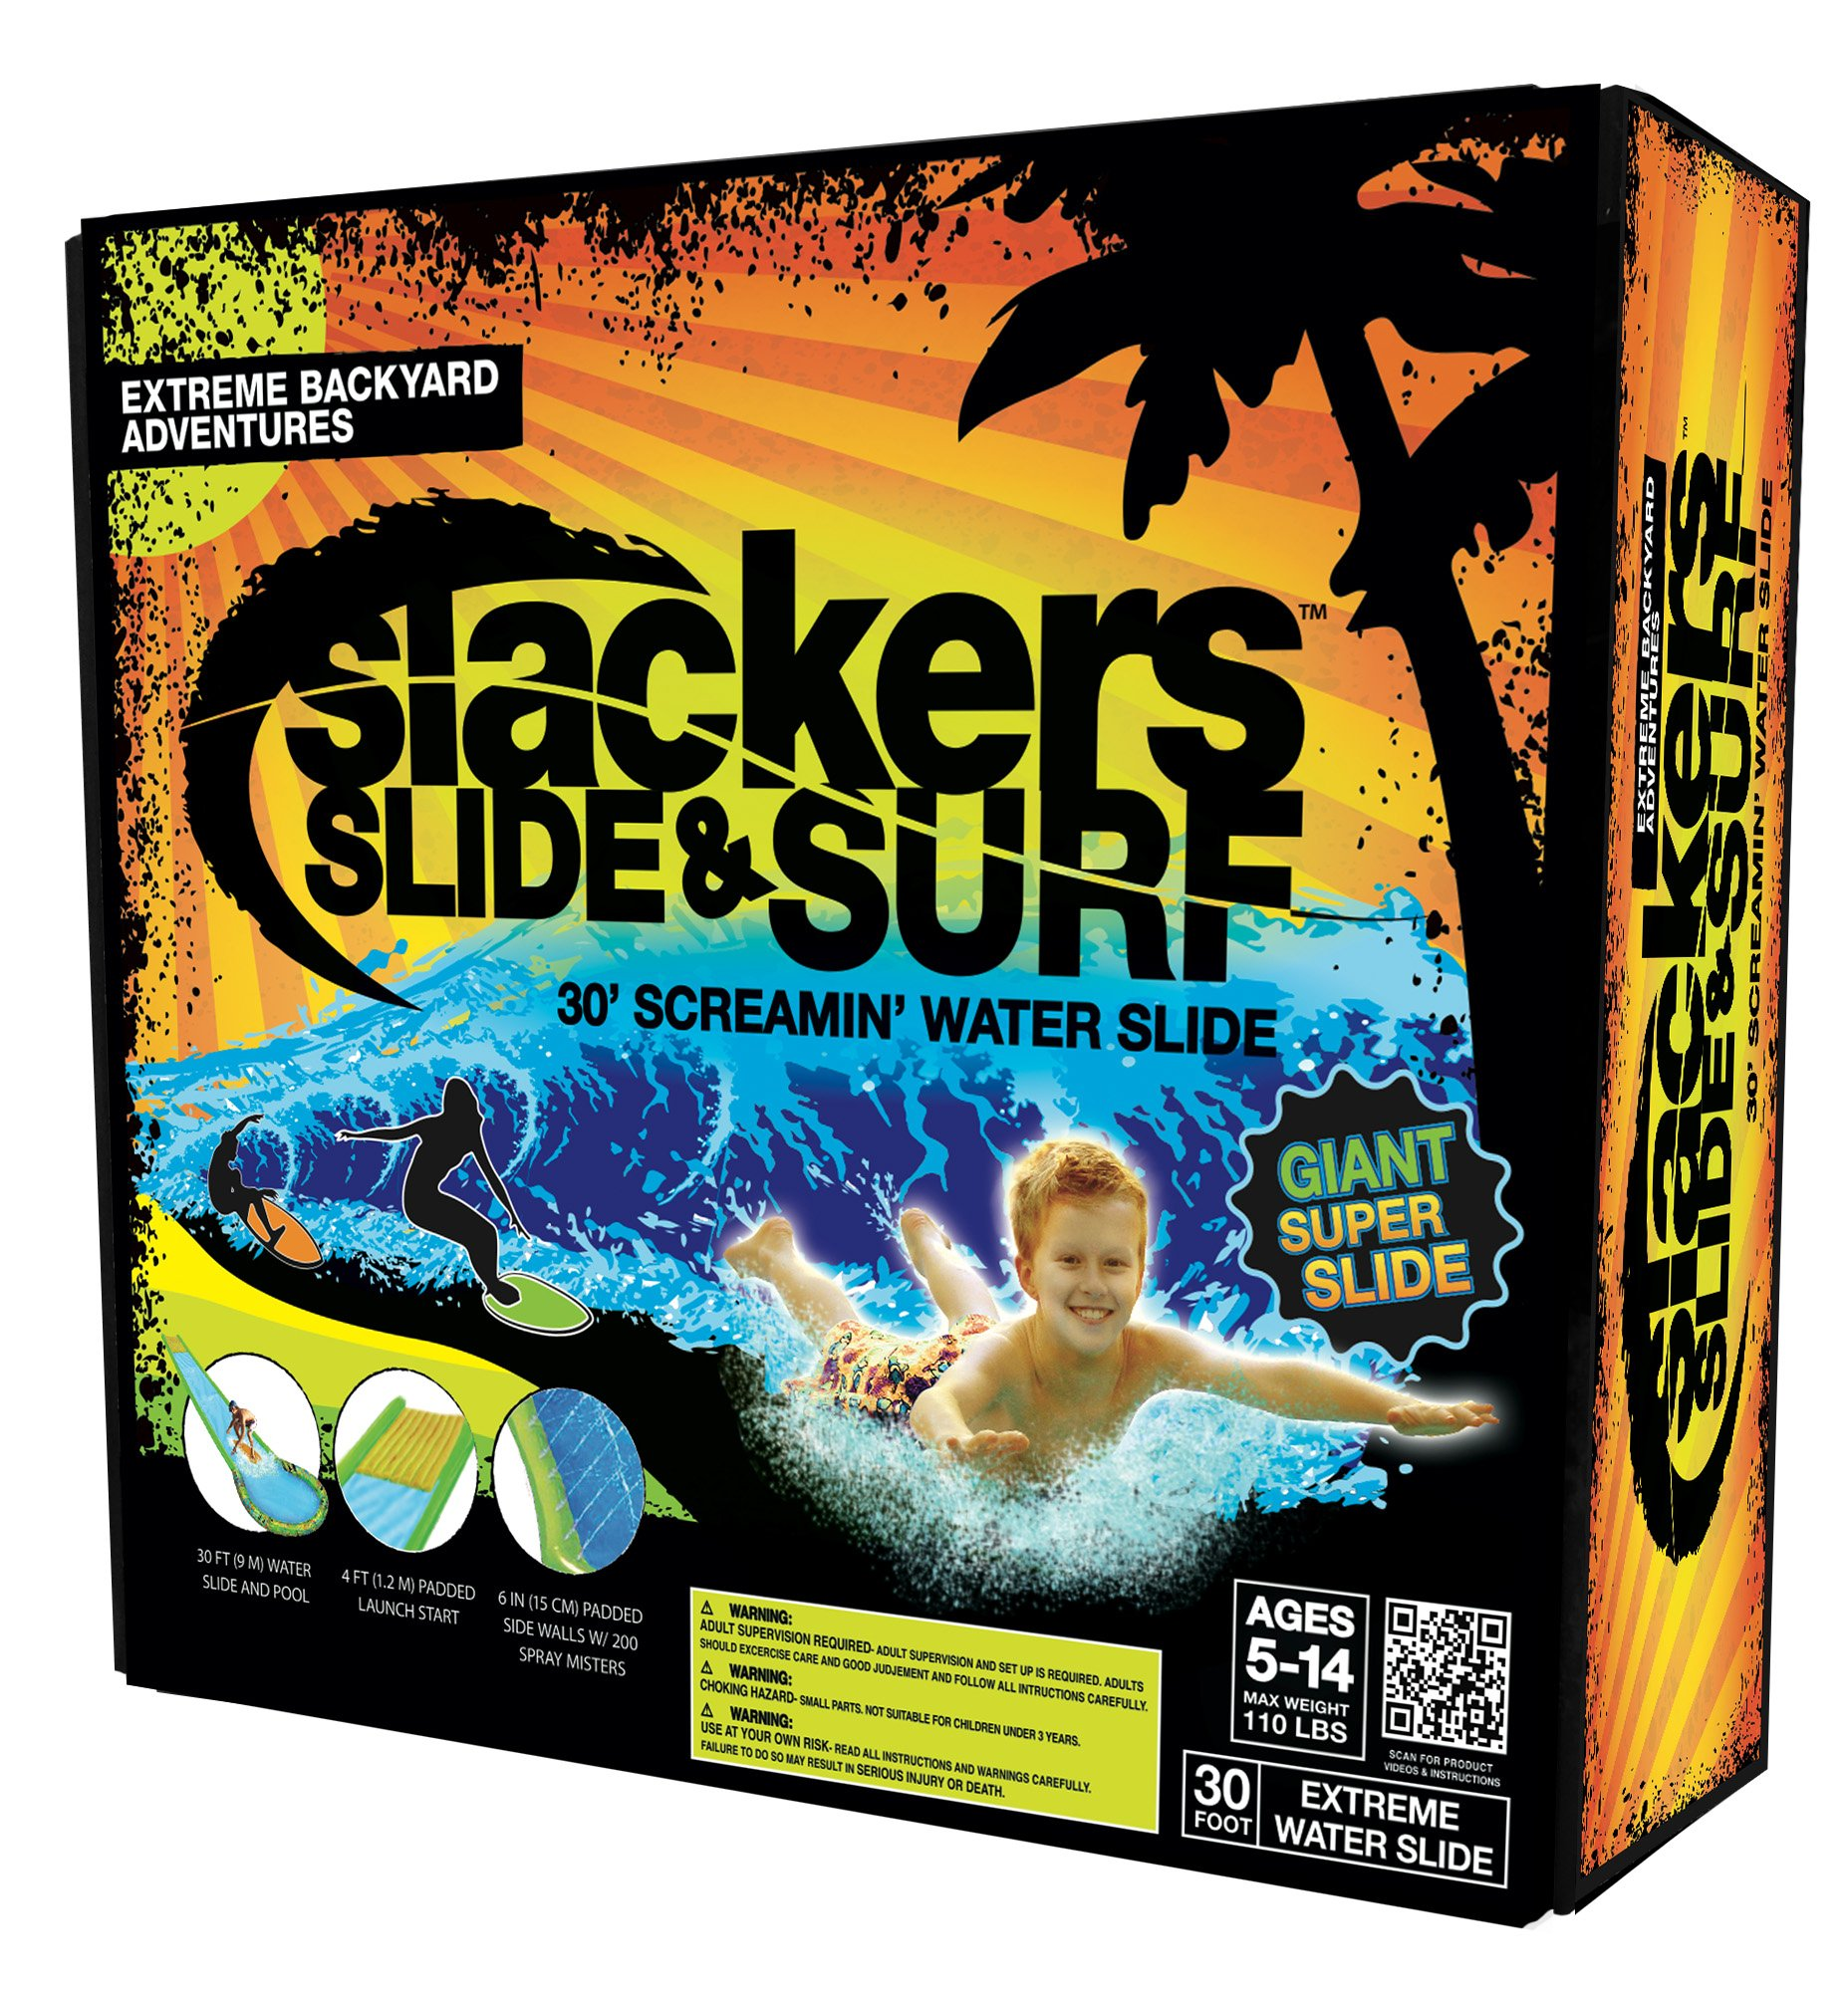 slackers Slide and Surf Screamin' 30' Water Slide Toy